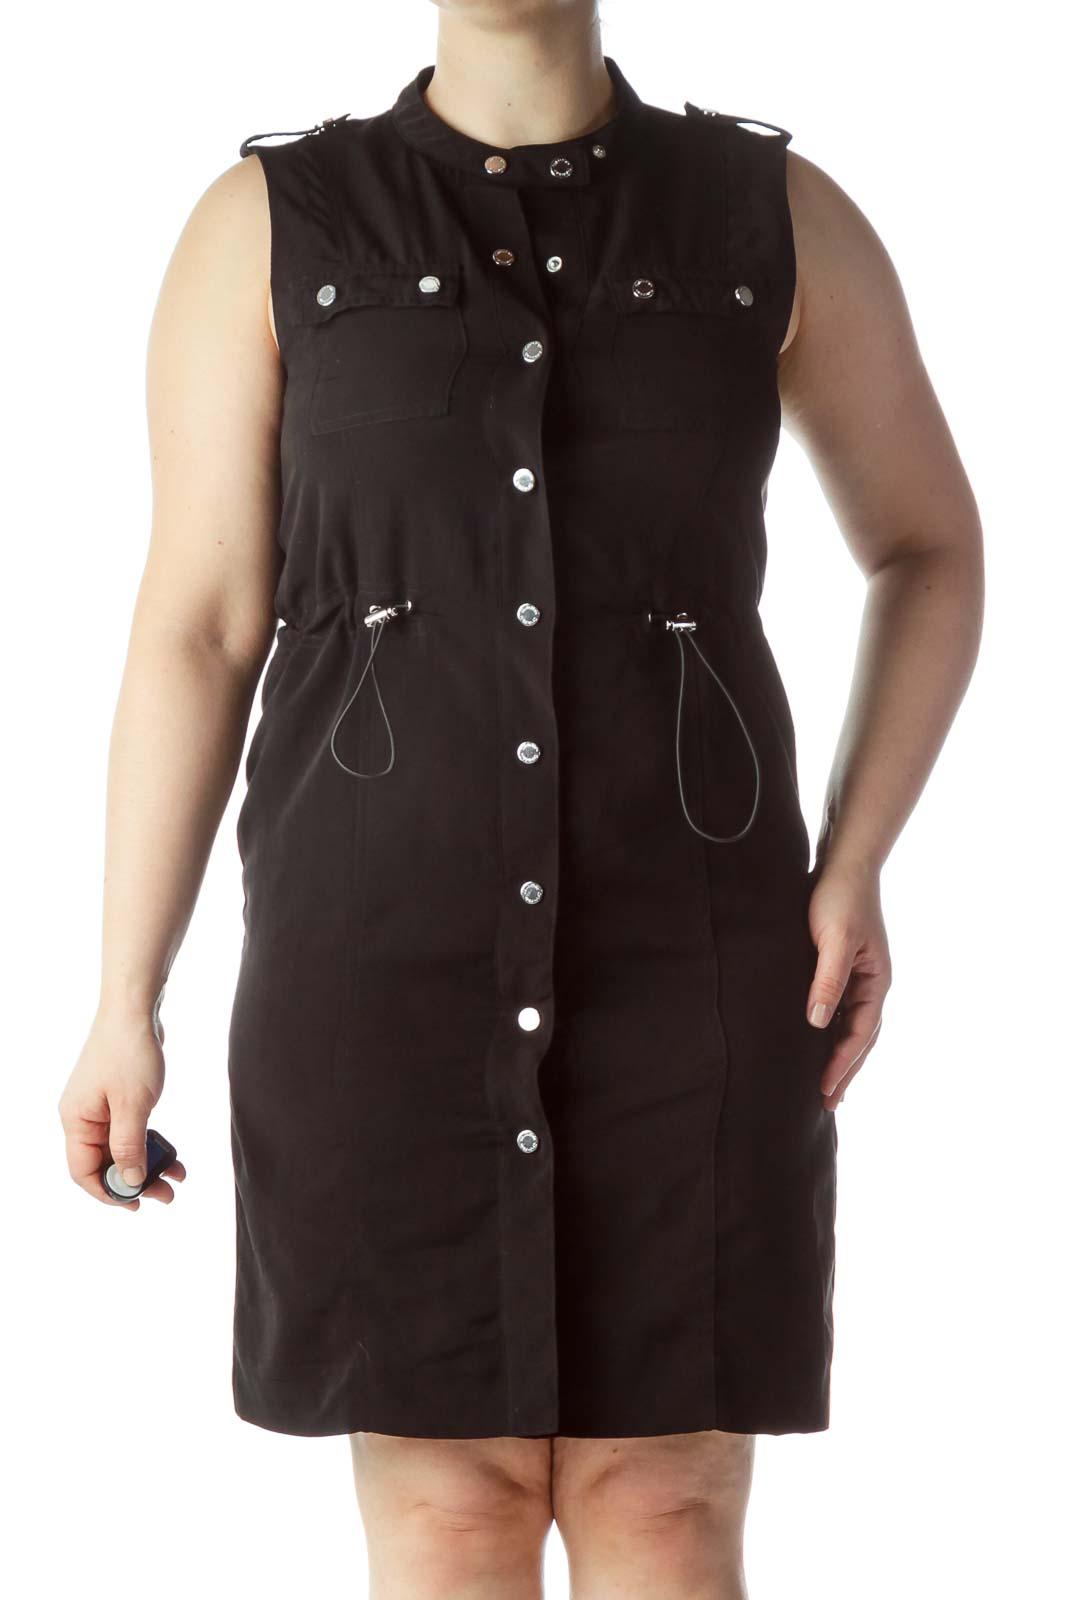 Black Snap Buttoned Sleeveless Dress